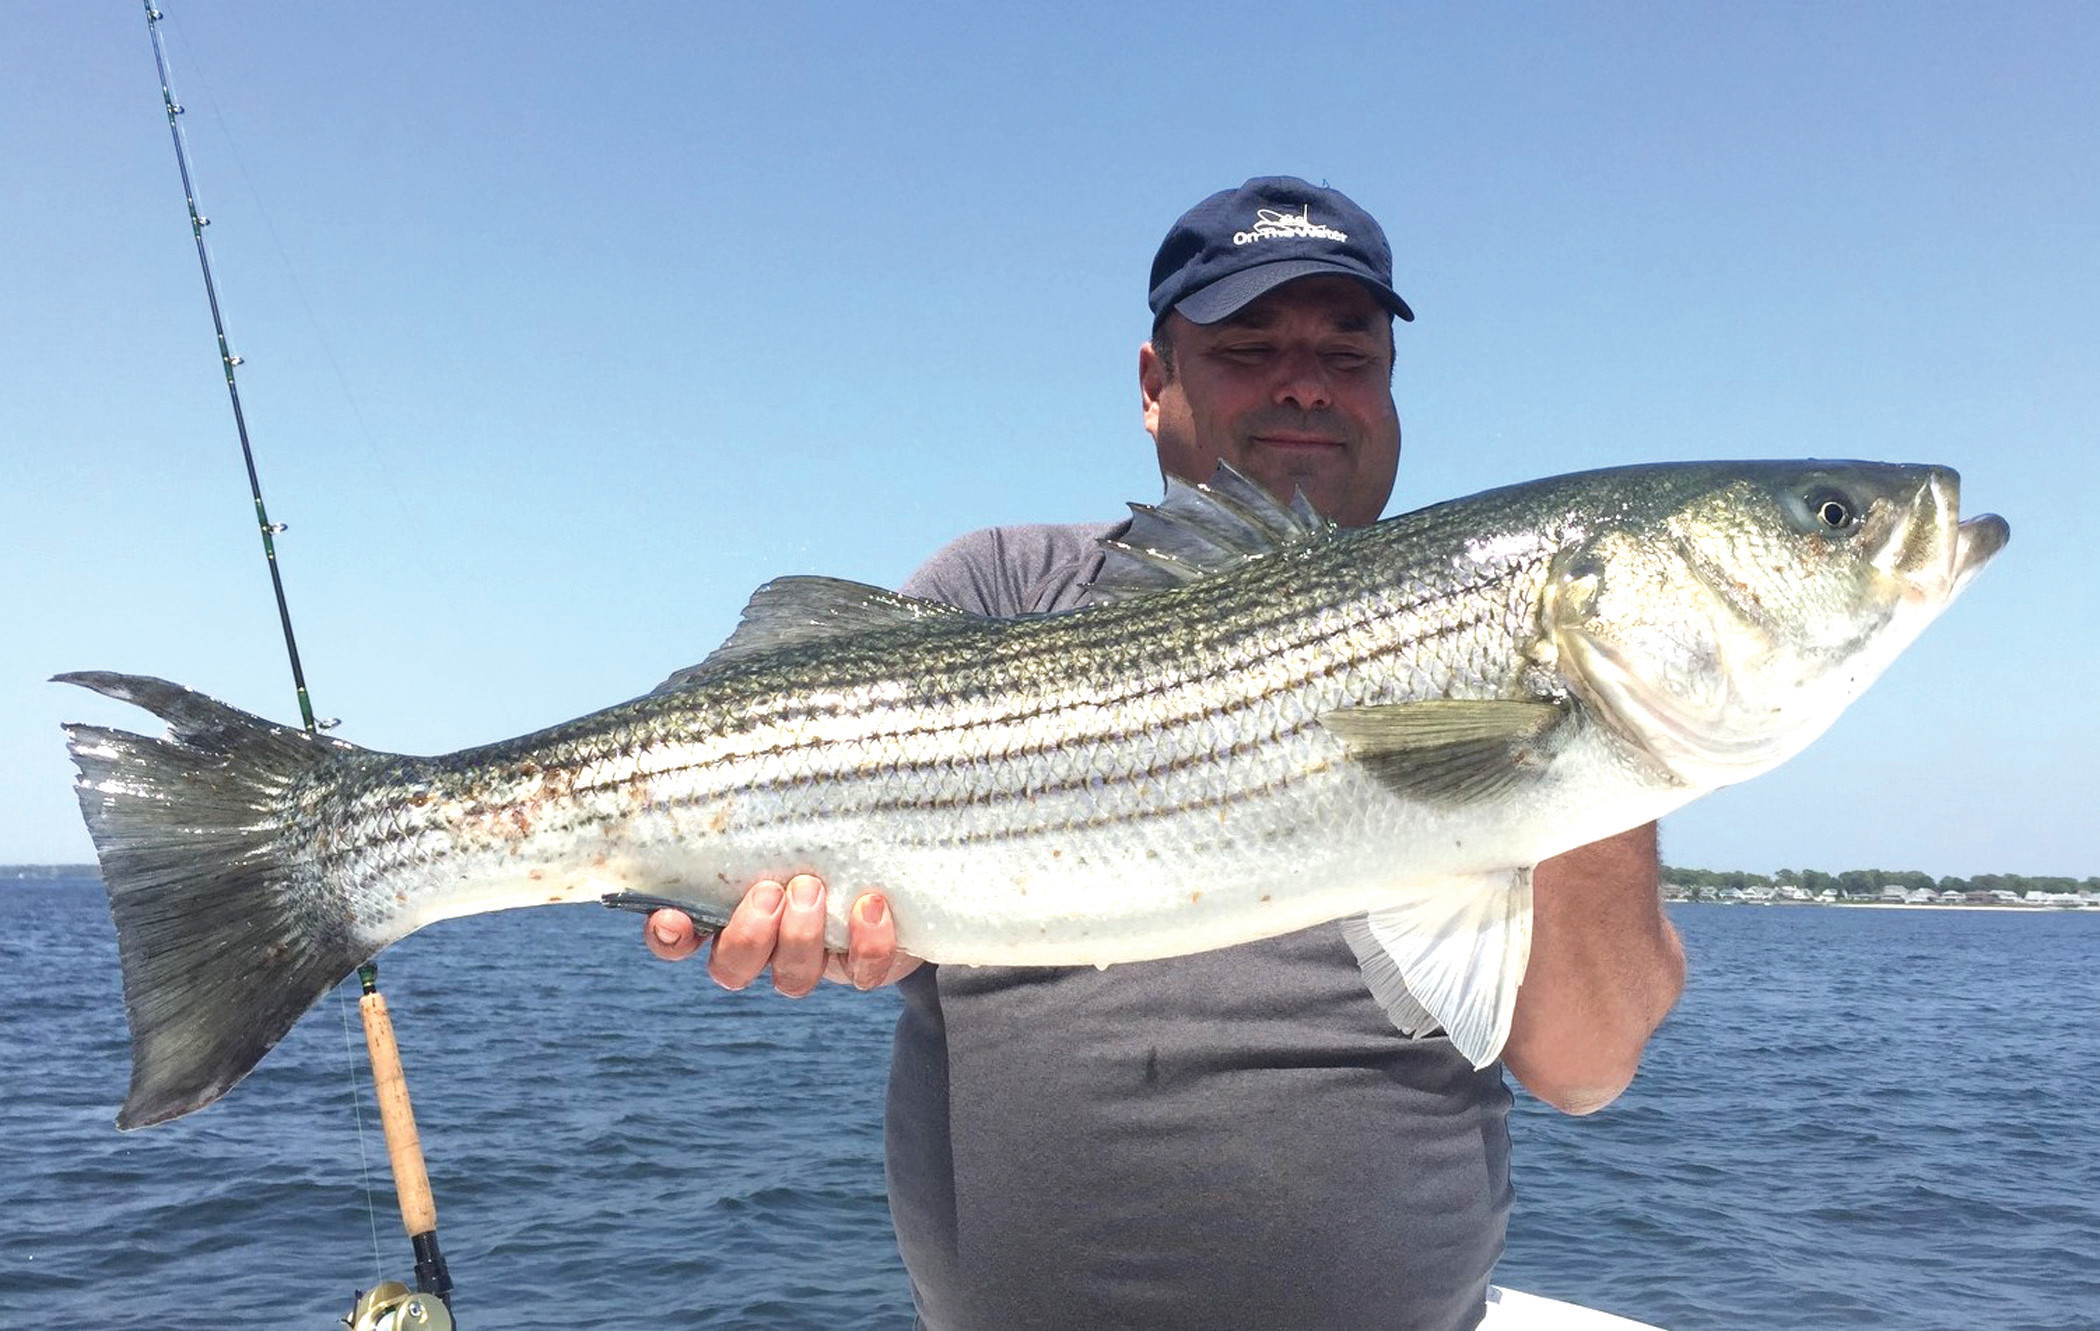 Bear Stripers striped bass fishing lights up | warwick beacon